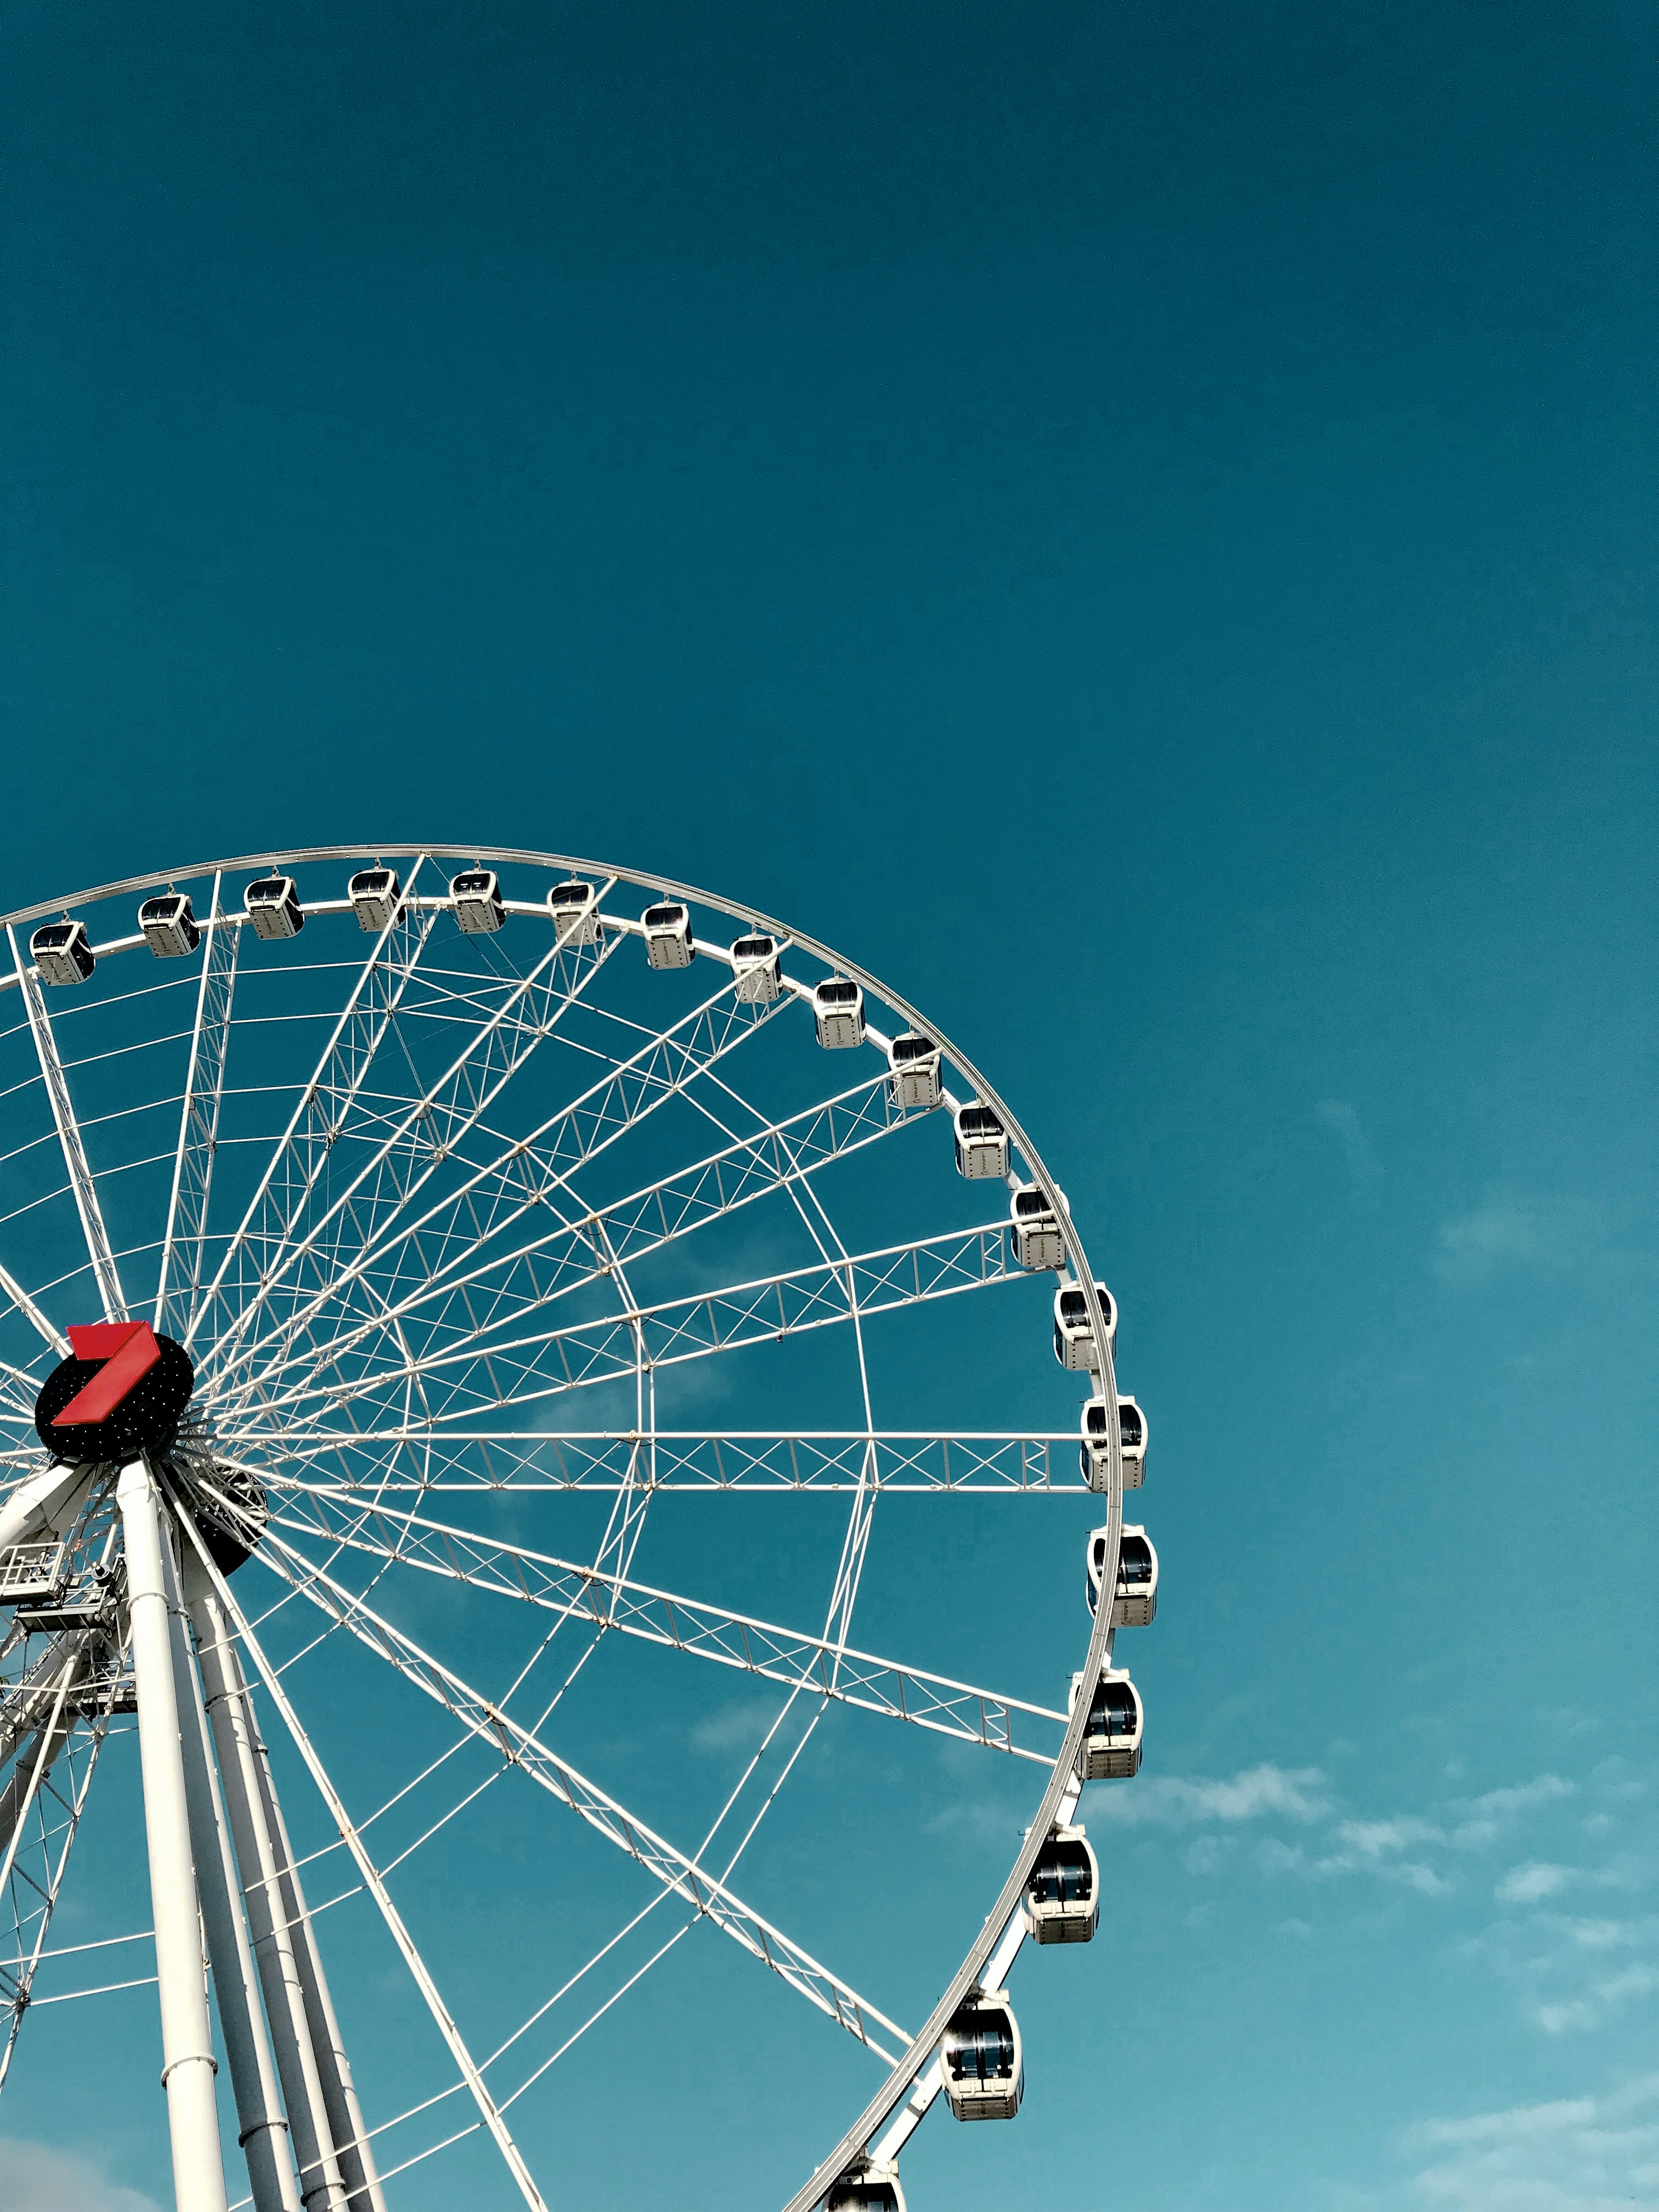 worm's-eye view of ferris wheel